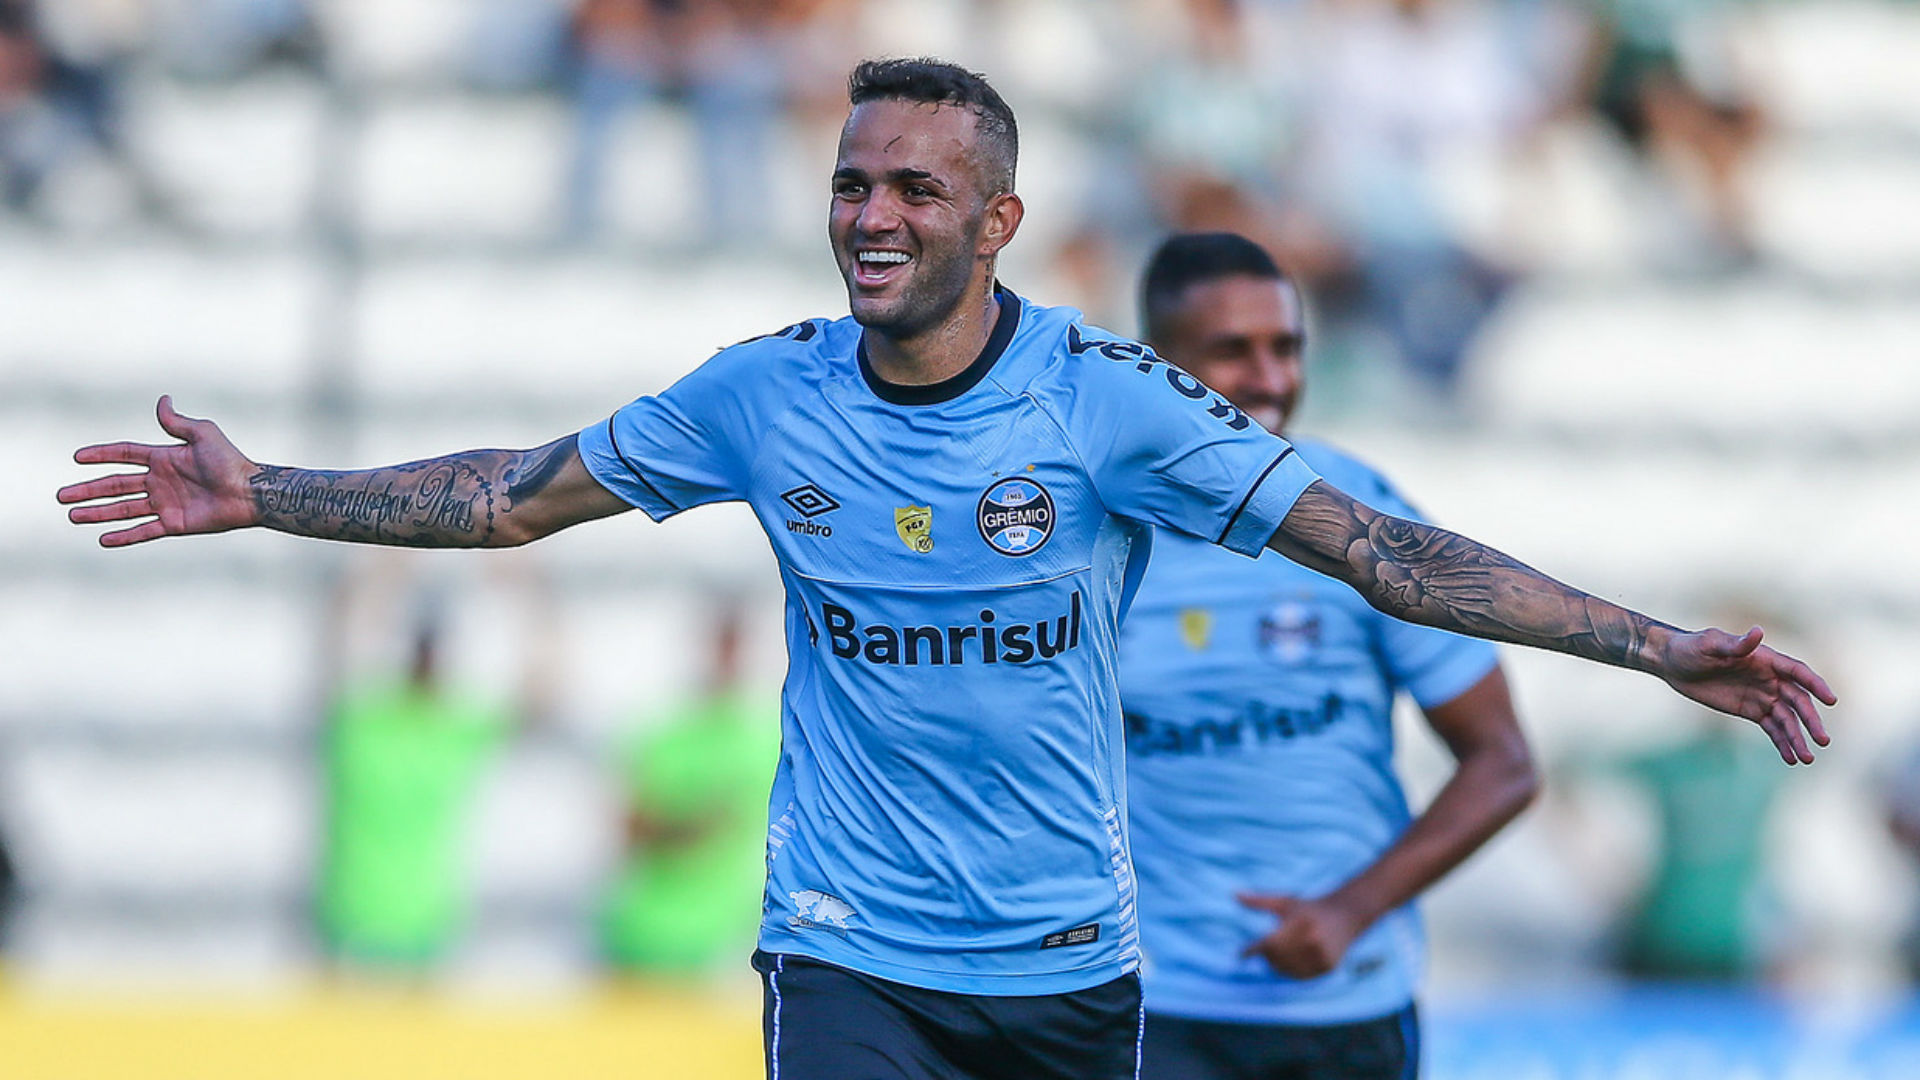 Luan Grêmio Juventude Campeonato Gaúcho 24 03 2019